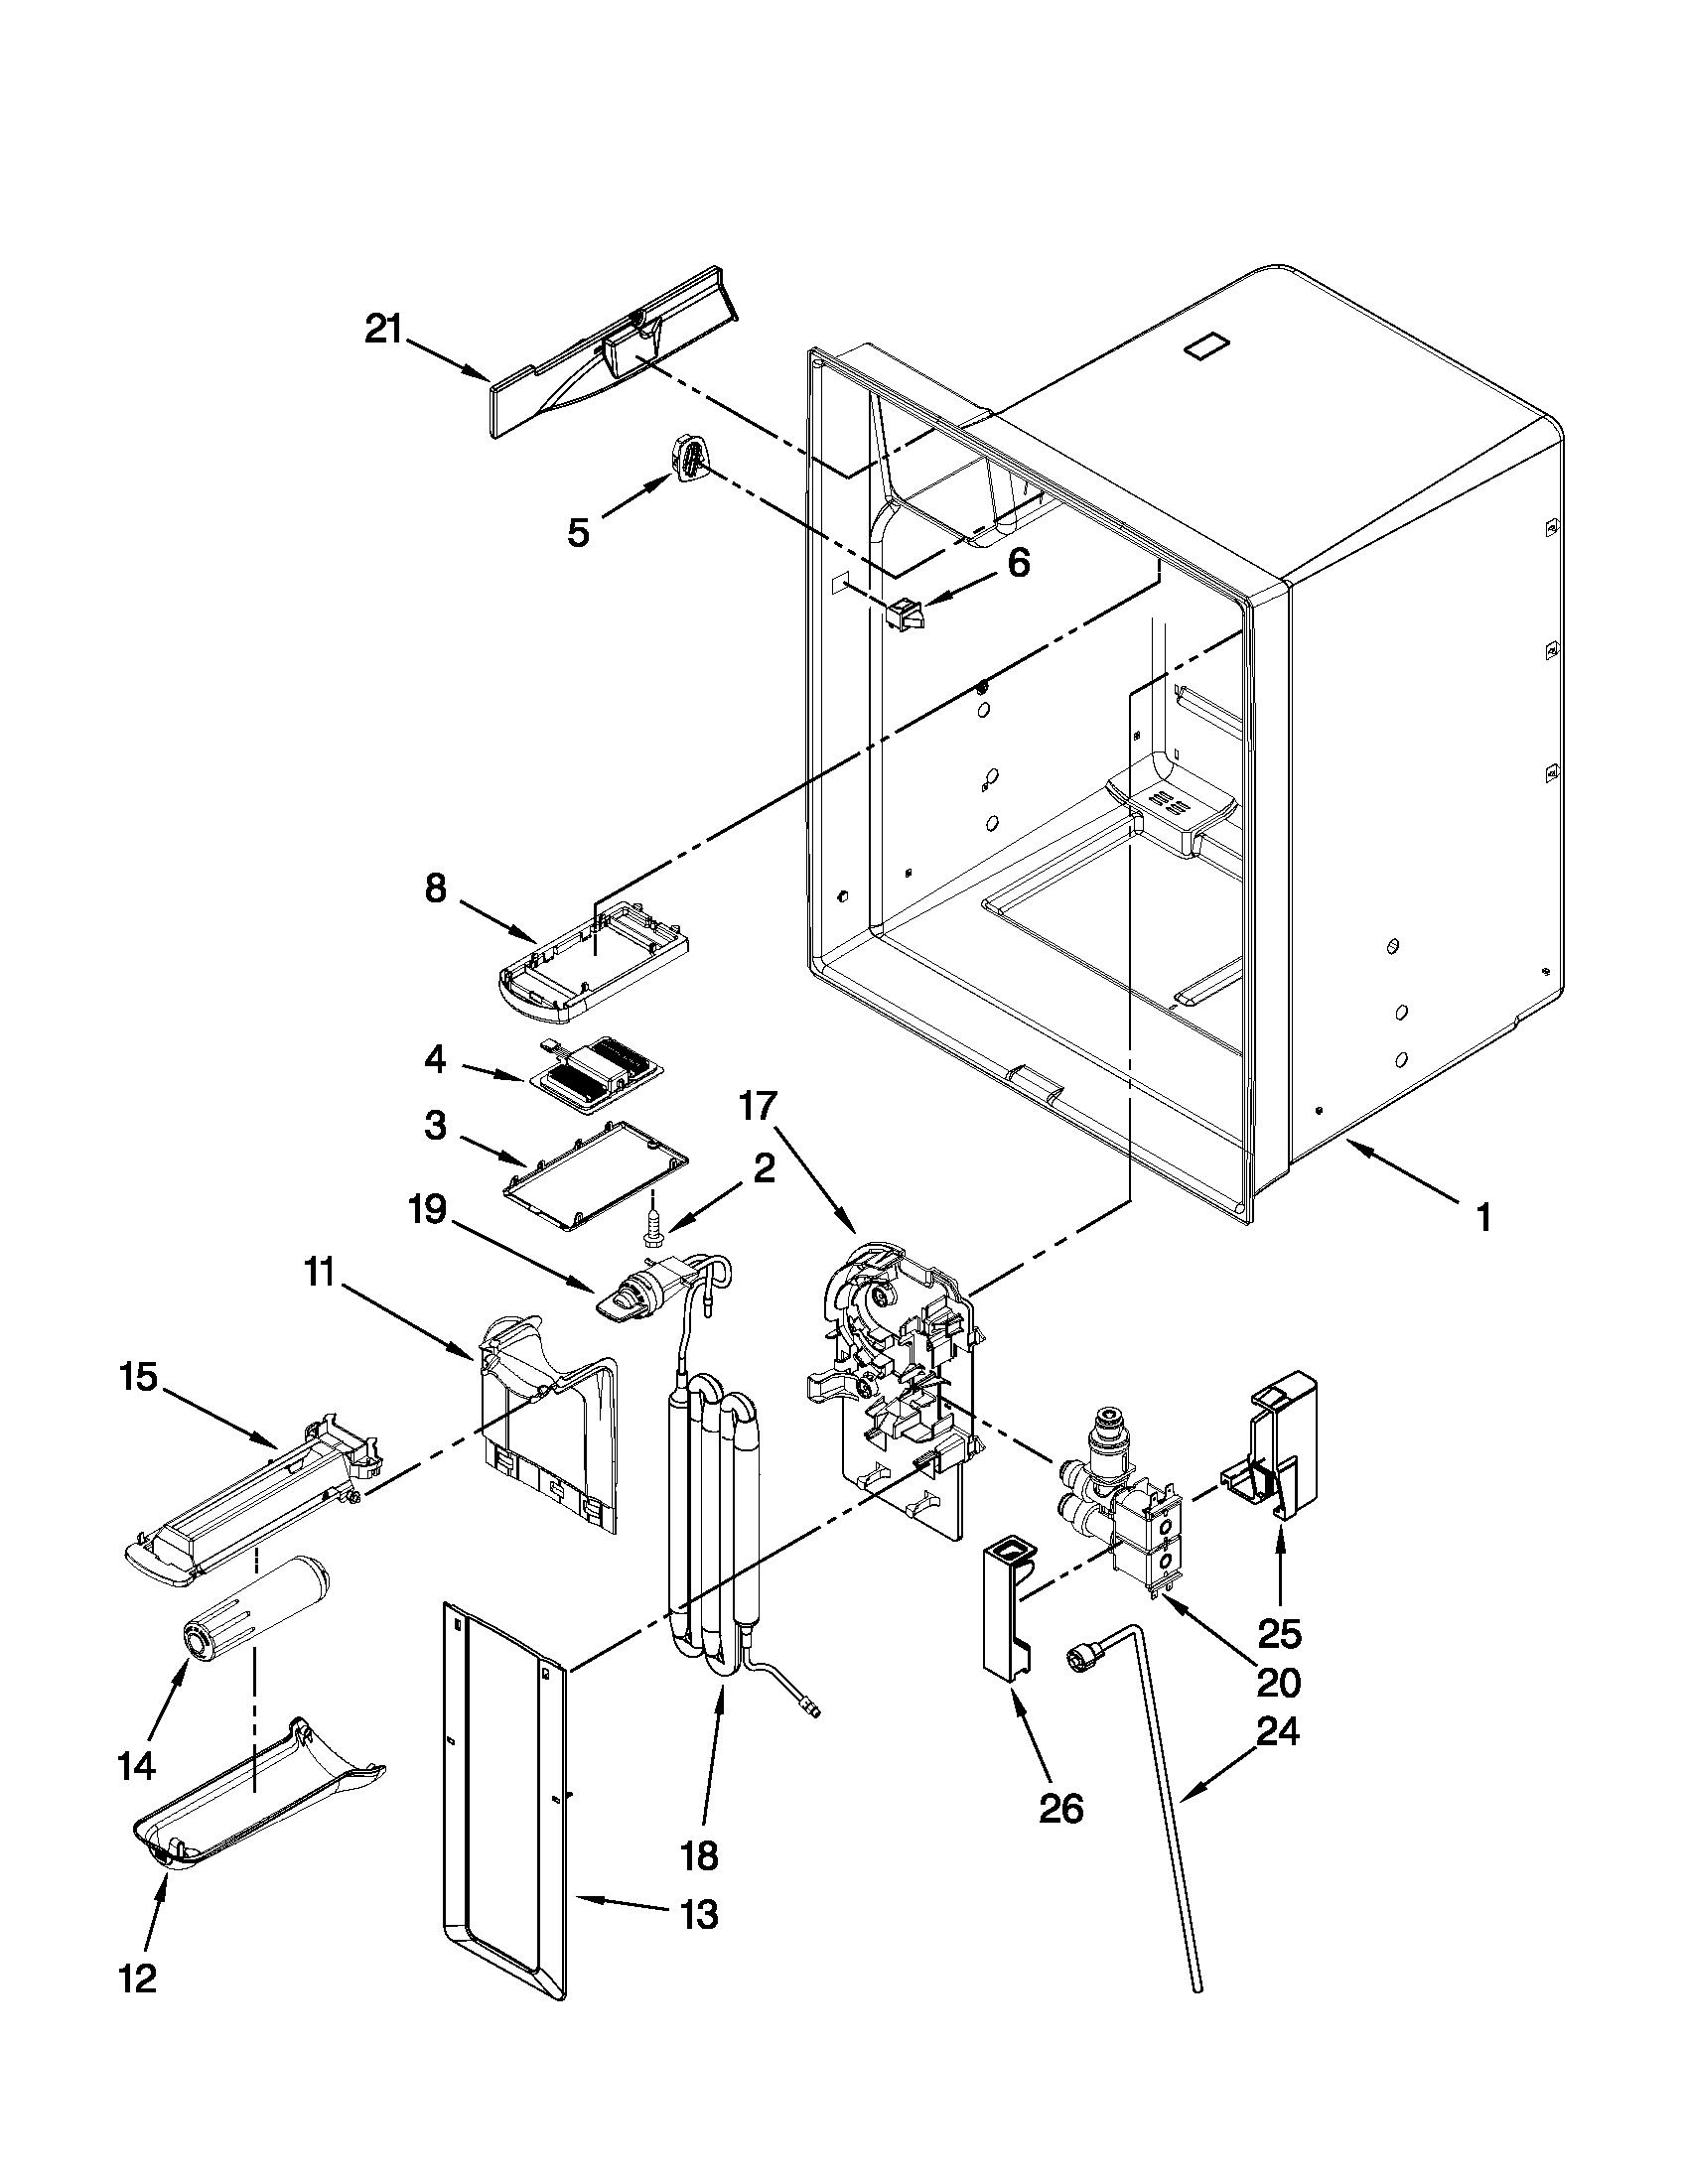 Whirlpool model GZ25FSRXYY2 bottom-mount refrigerator